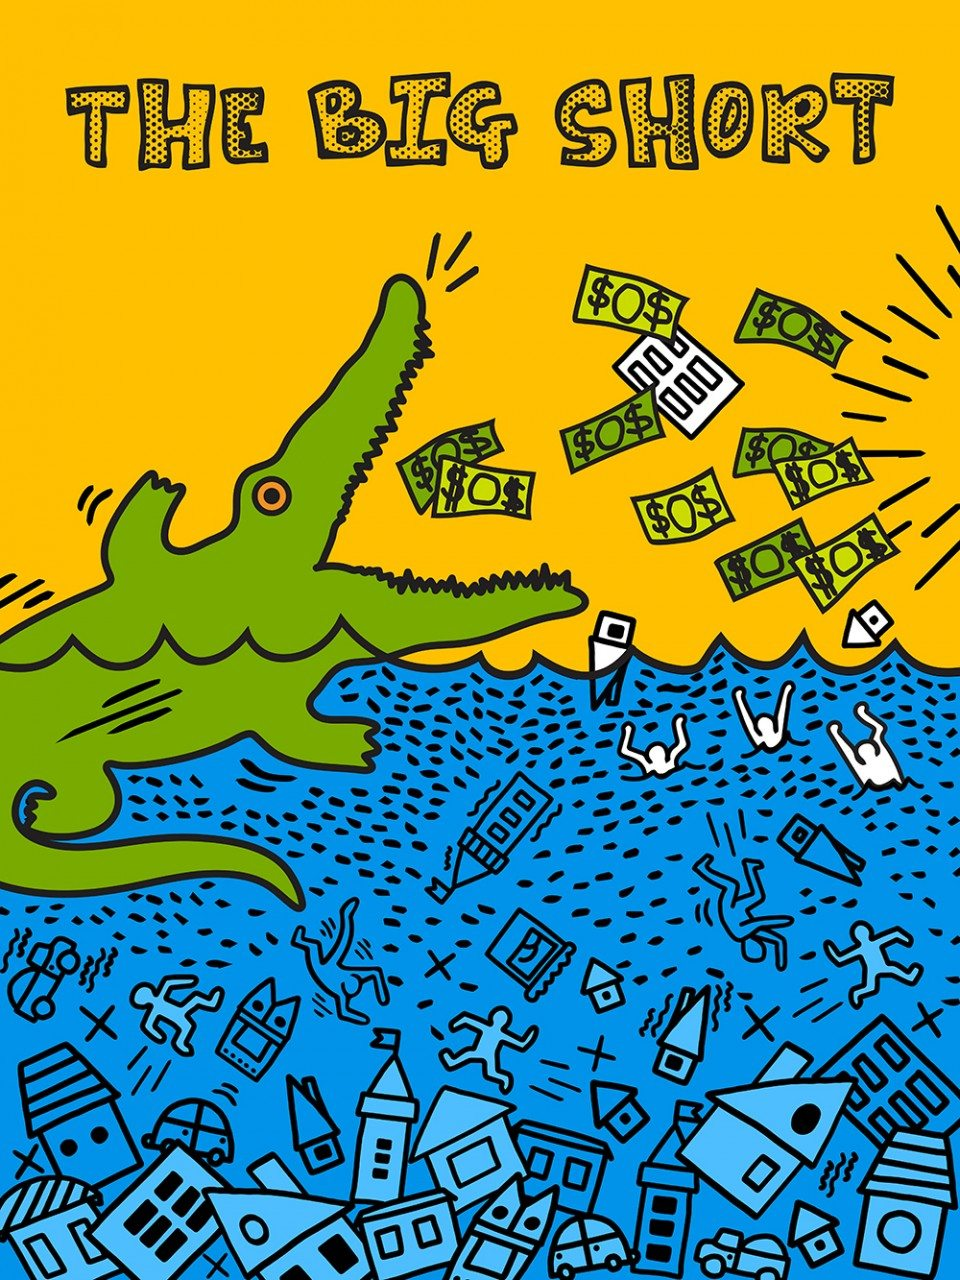 The Big Short, Flo Lau (İlham kaynağı: Keith Haring)